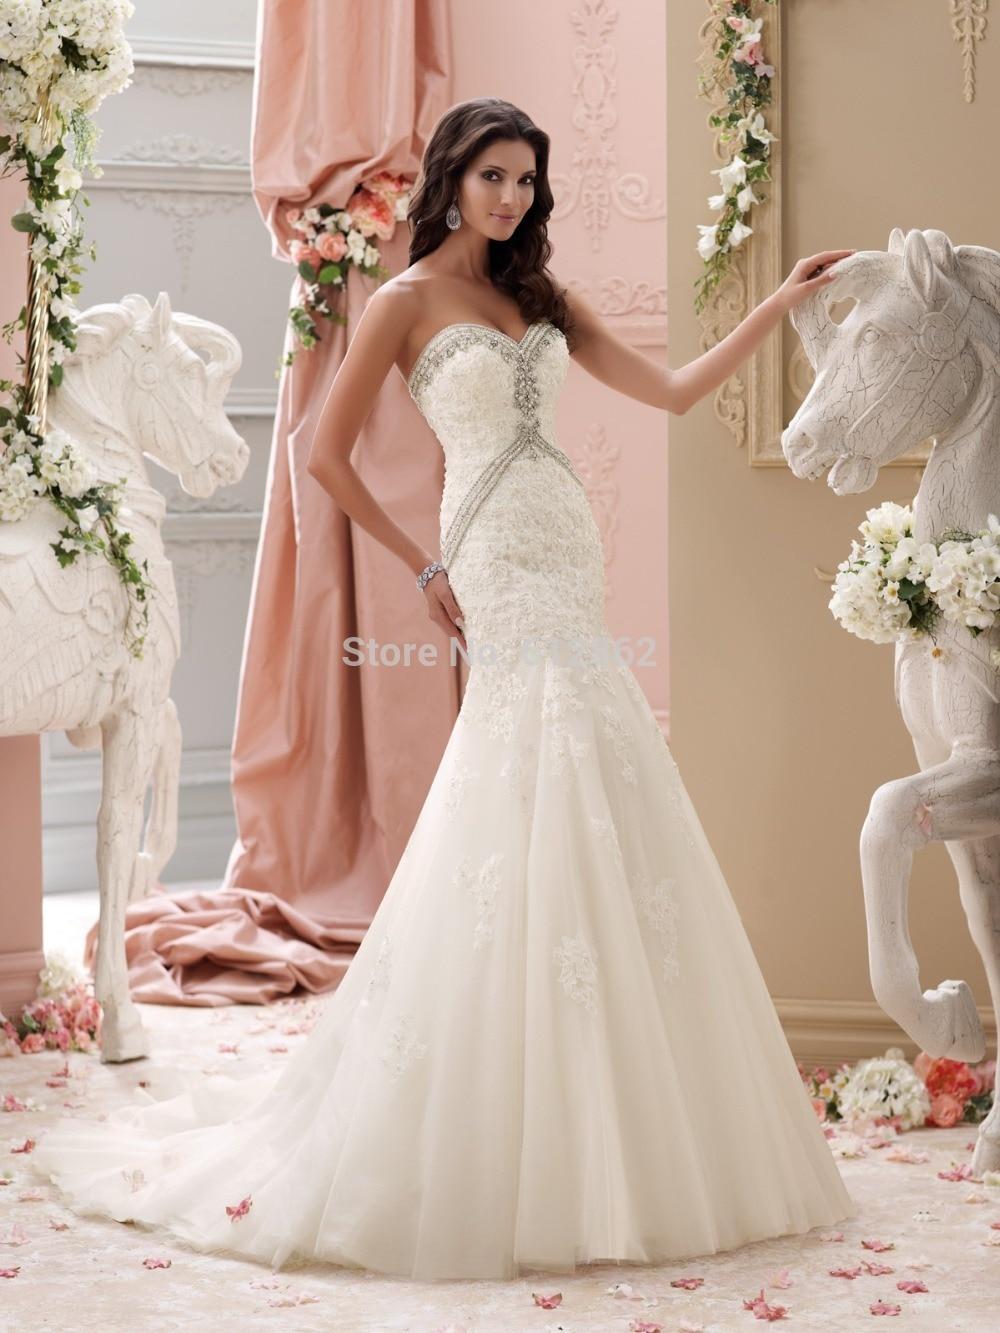 Strapless Corset Mermaid Wedding Dresses